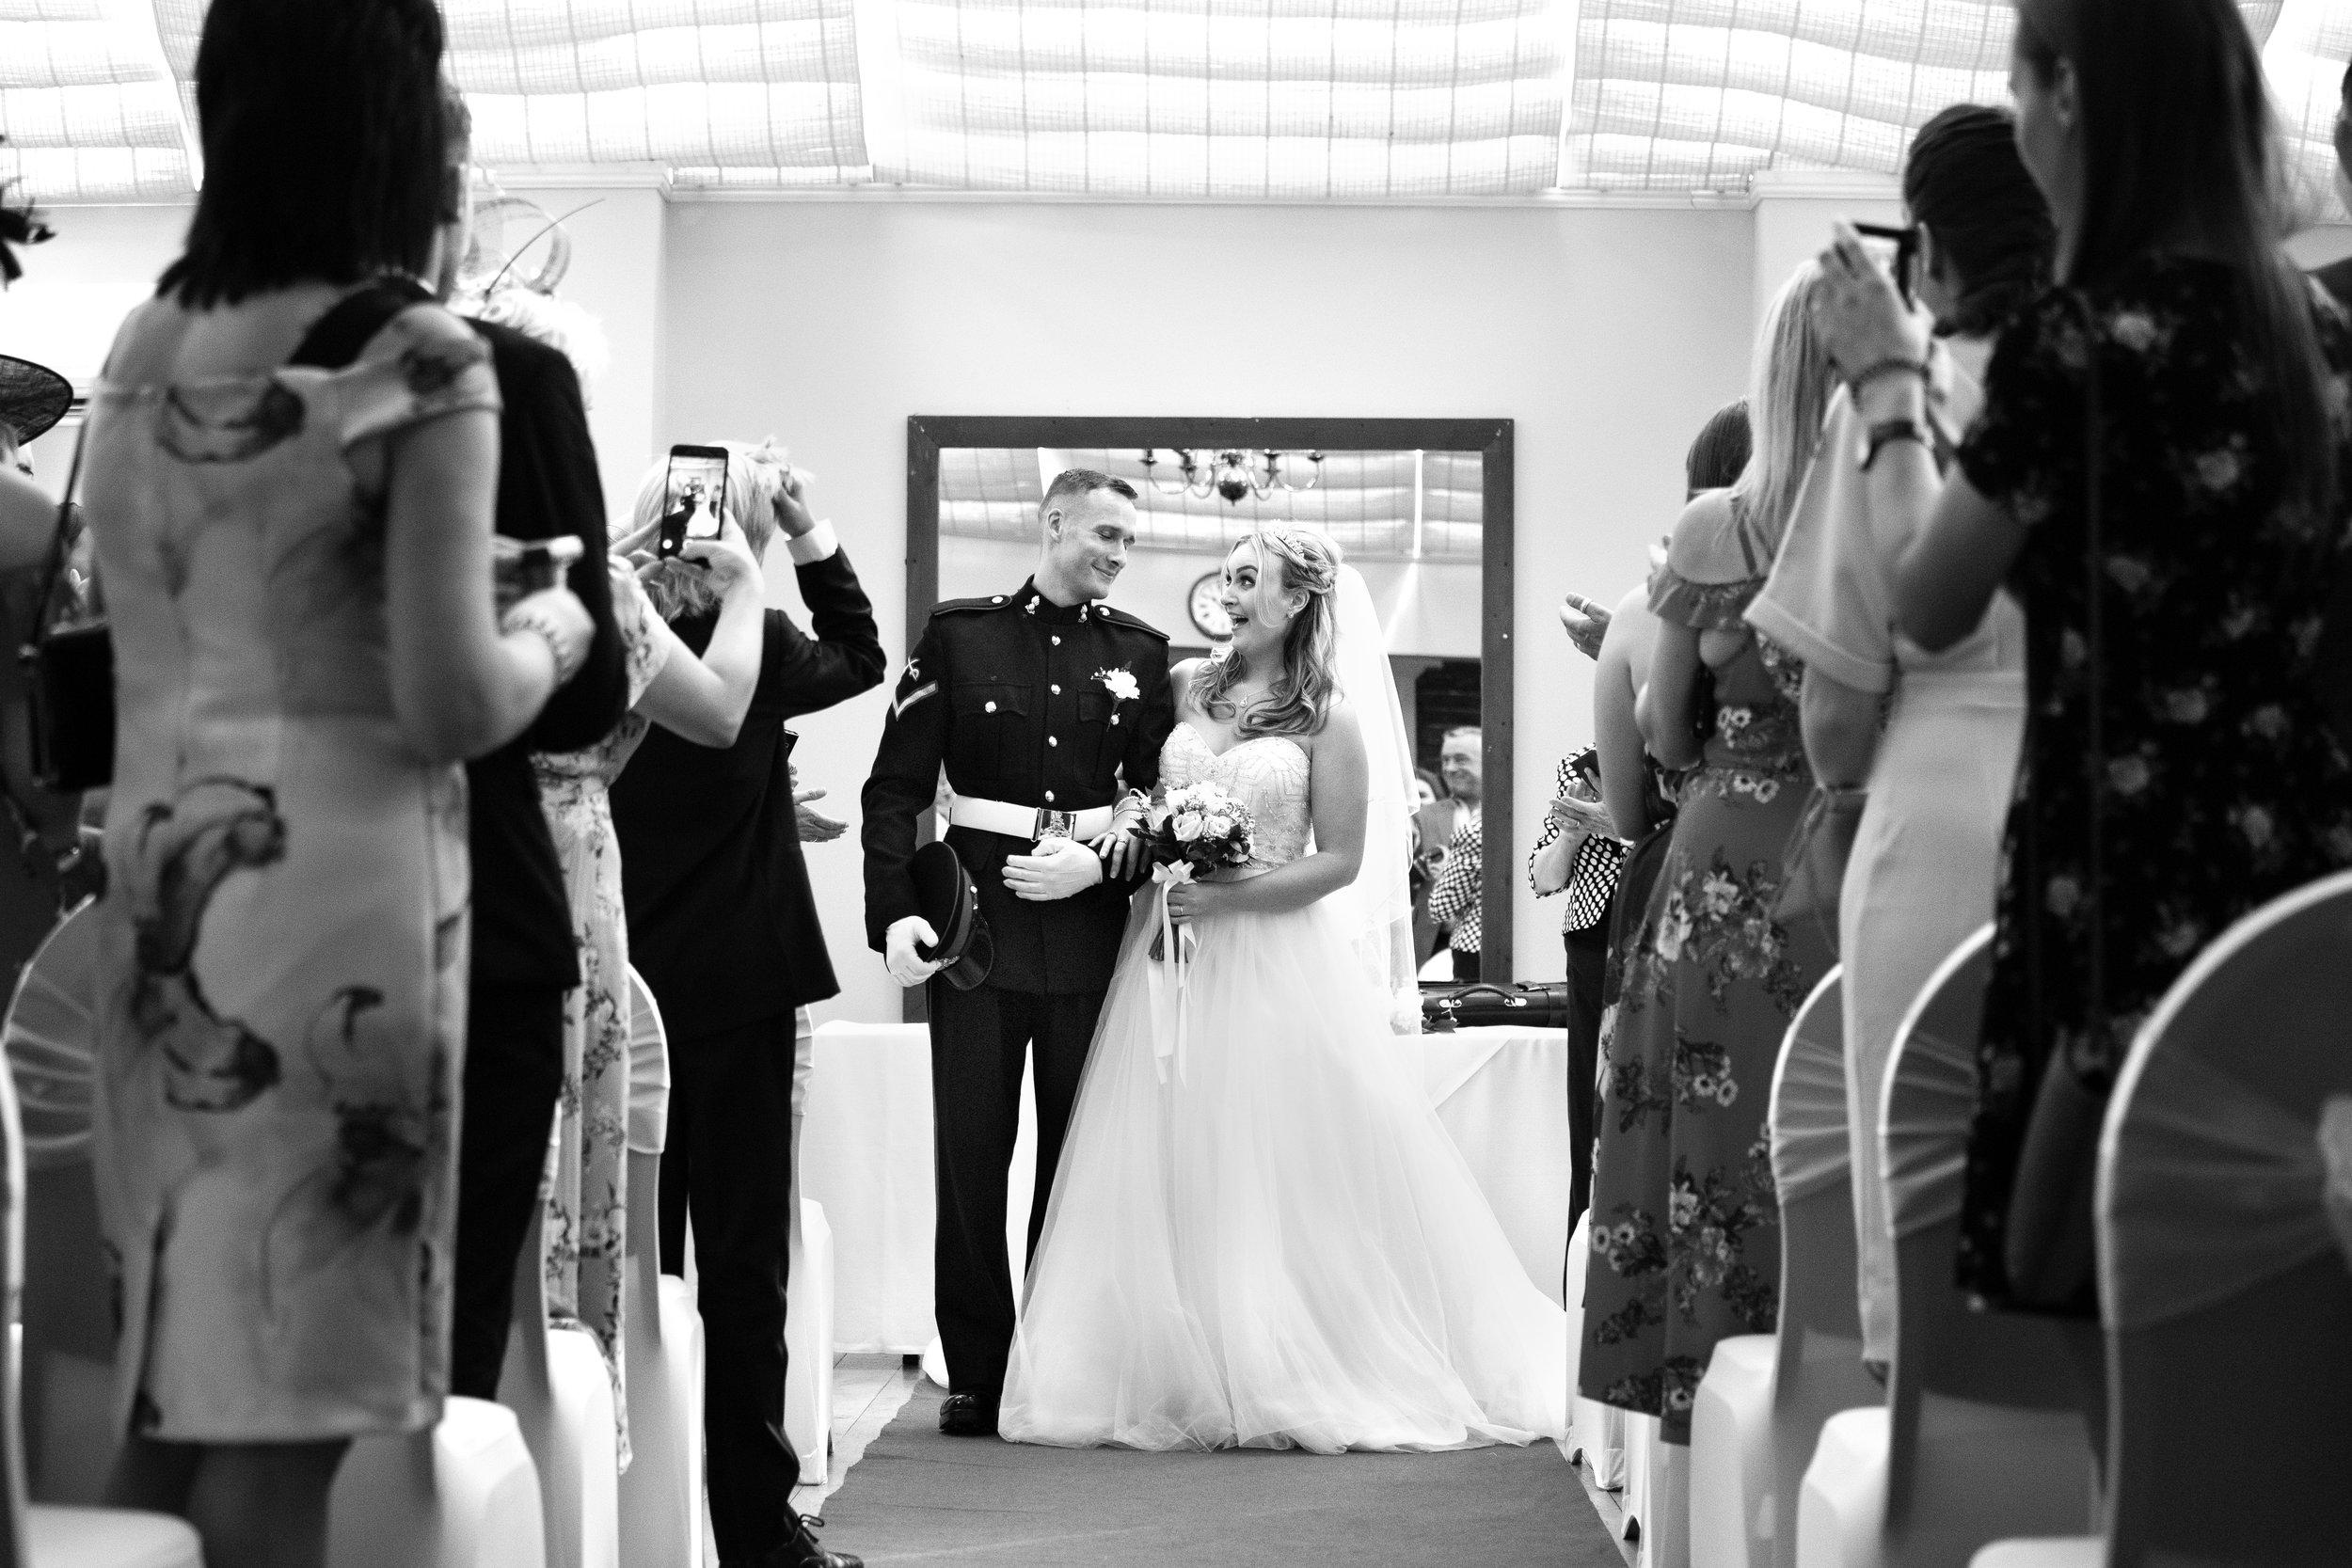 wedding-lea-cooper-photography-willenhall-west-midlands-wolverhampton-dudley-birmingham-uk-marriage-hadley-park-east-telford-walking-down-the-isle.jpg